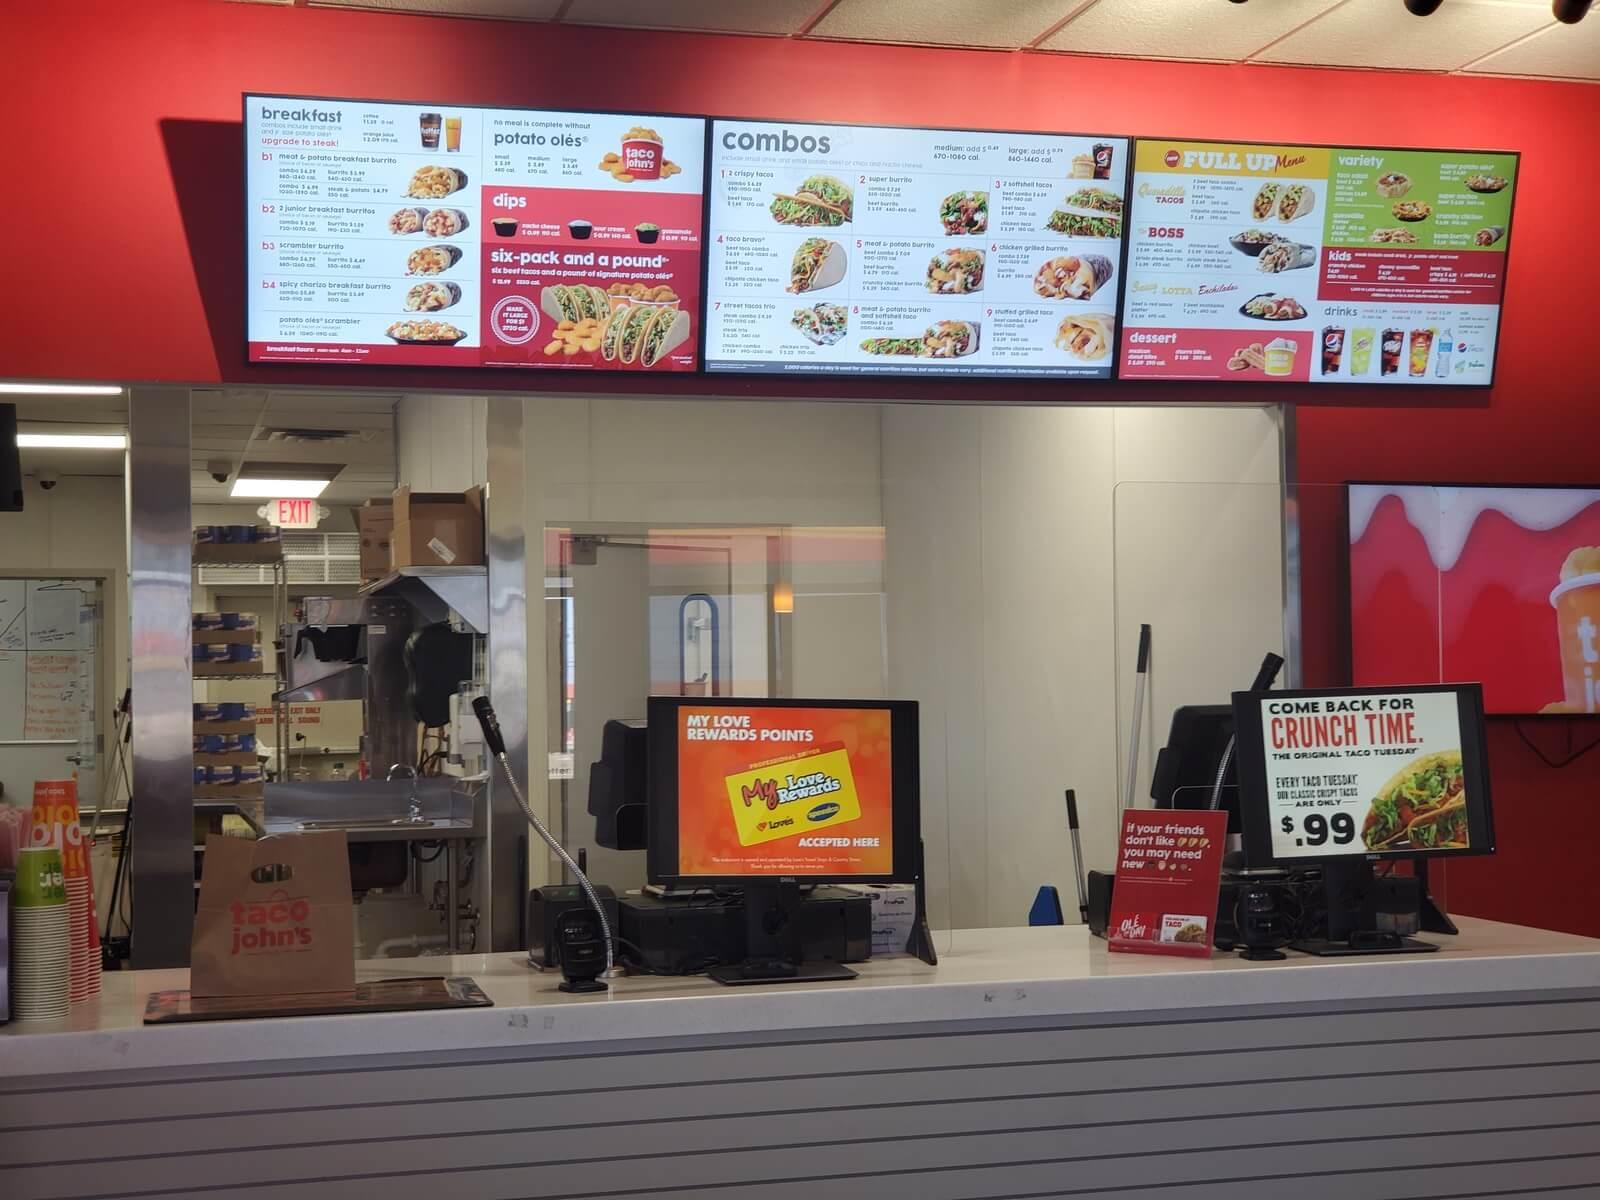 Taco Johns in Loves - Circleville, Ohio